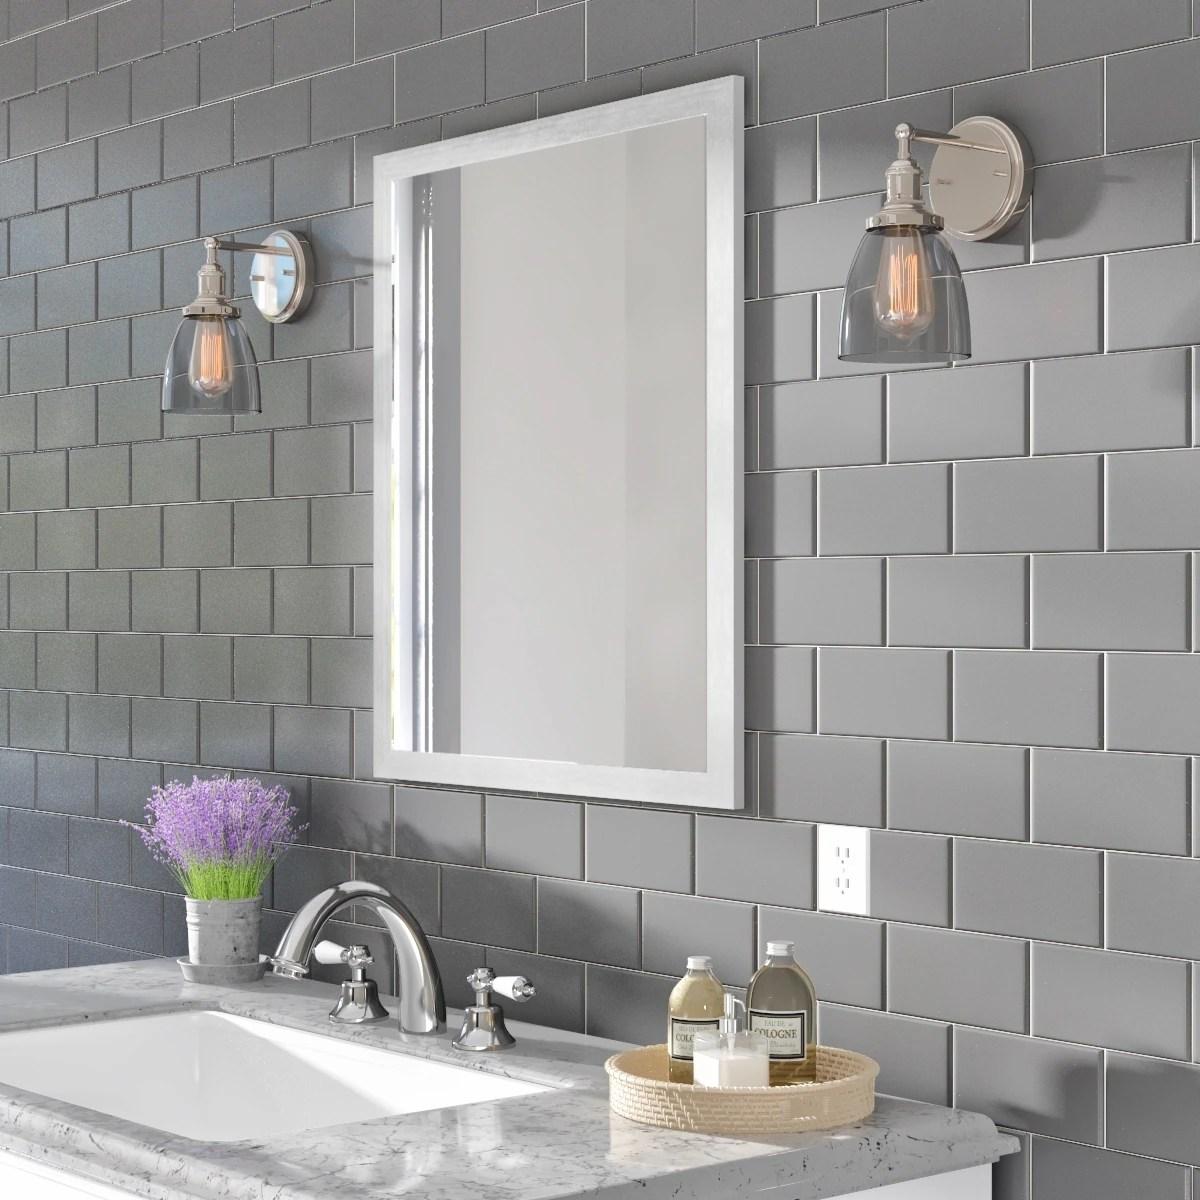 classic ceramic 3x6 inch wall tile in matte desert gray 3x6